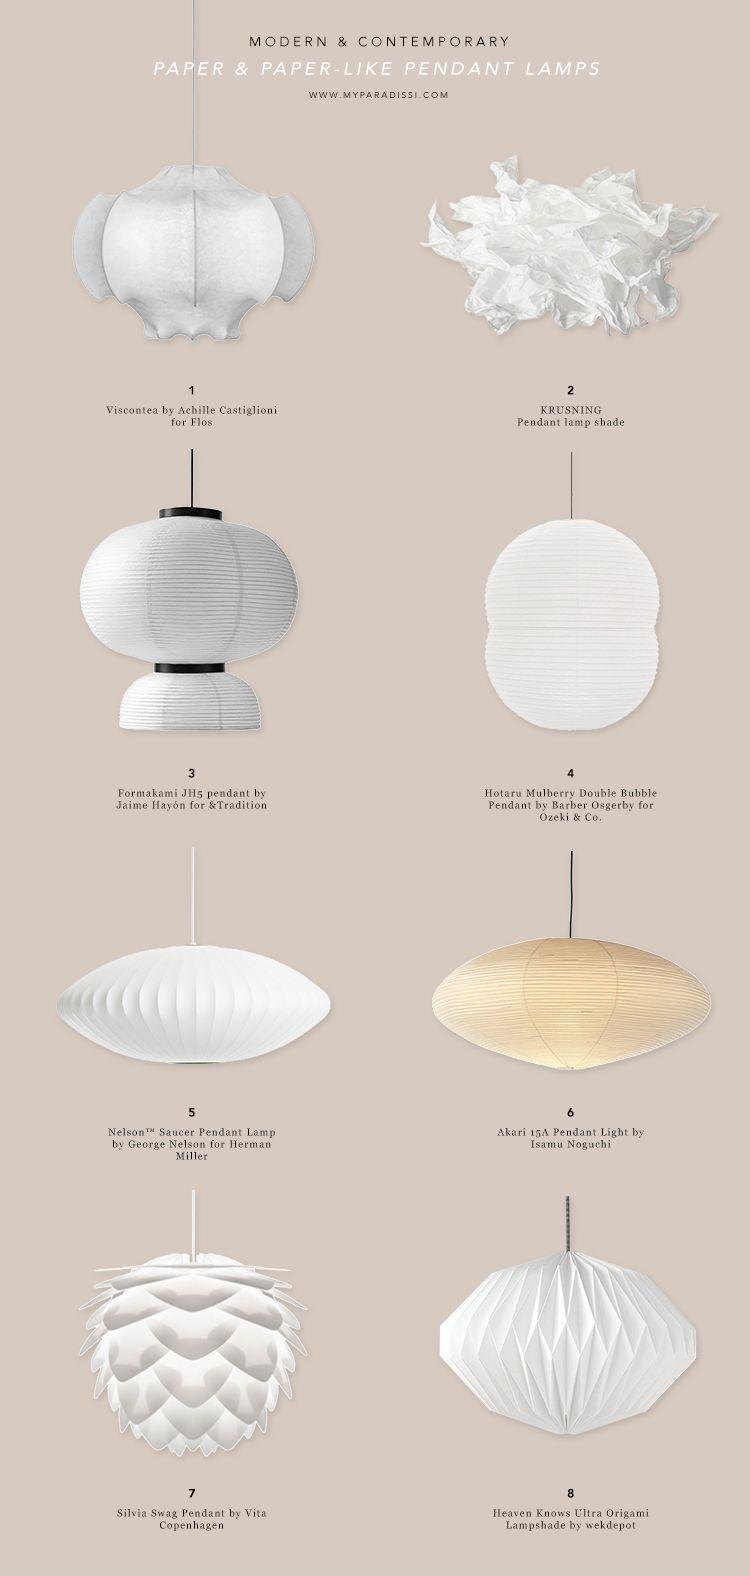 Paper Like Pendant Lamps